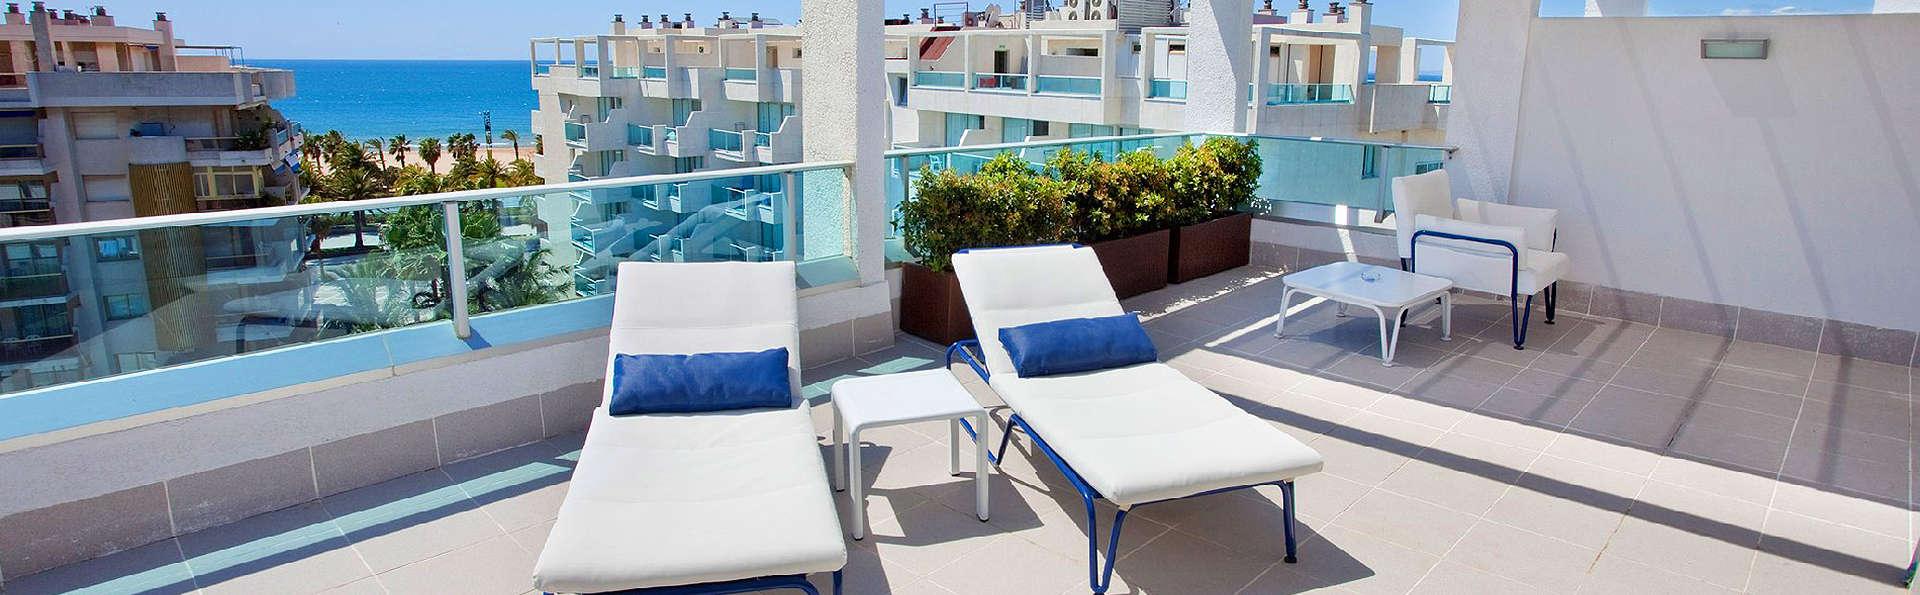 Blaumar Hotel - EDIT_Terrace.jpg